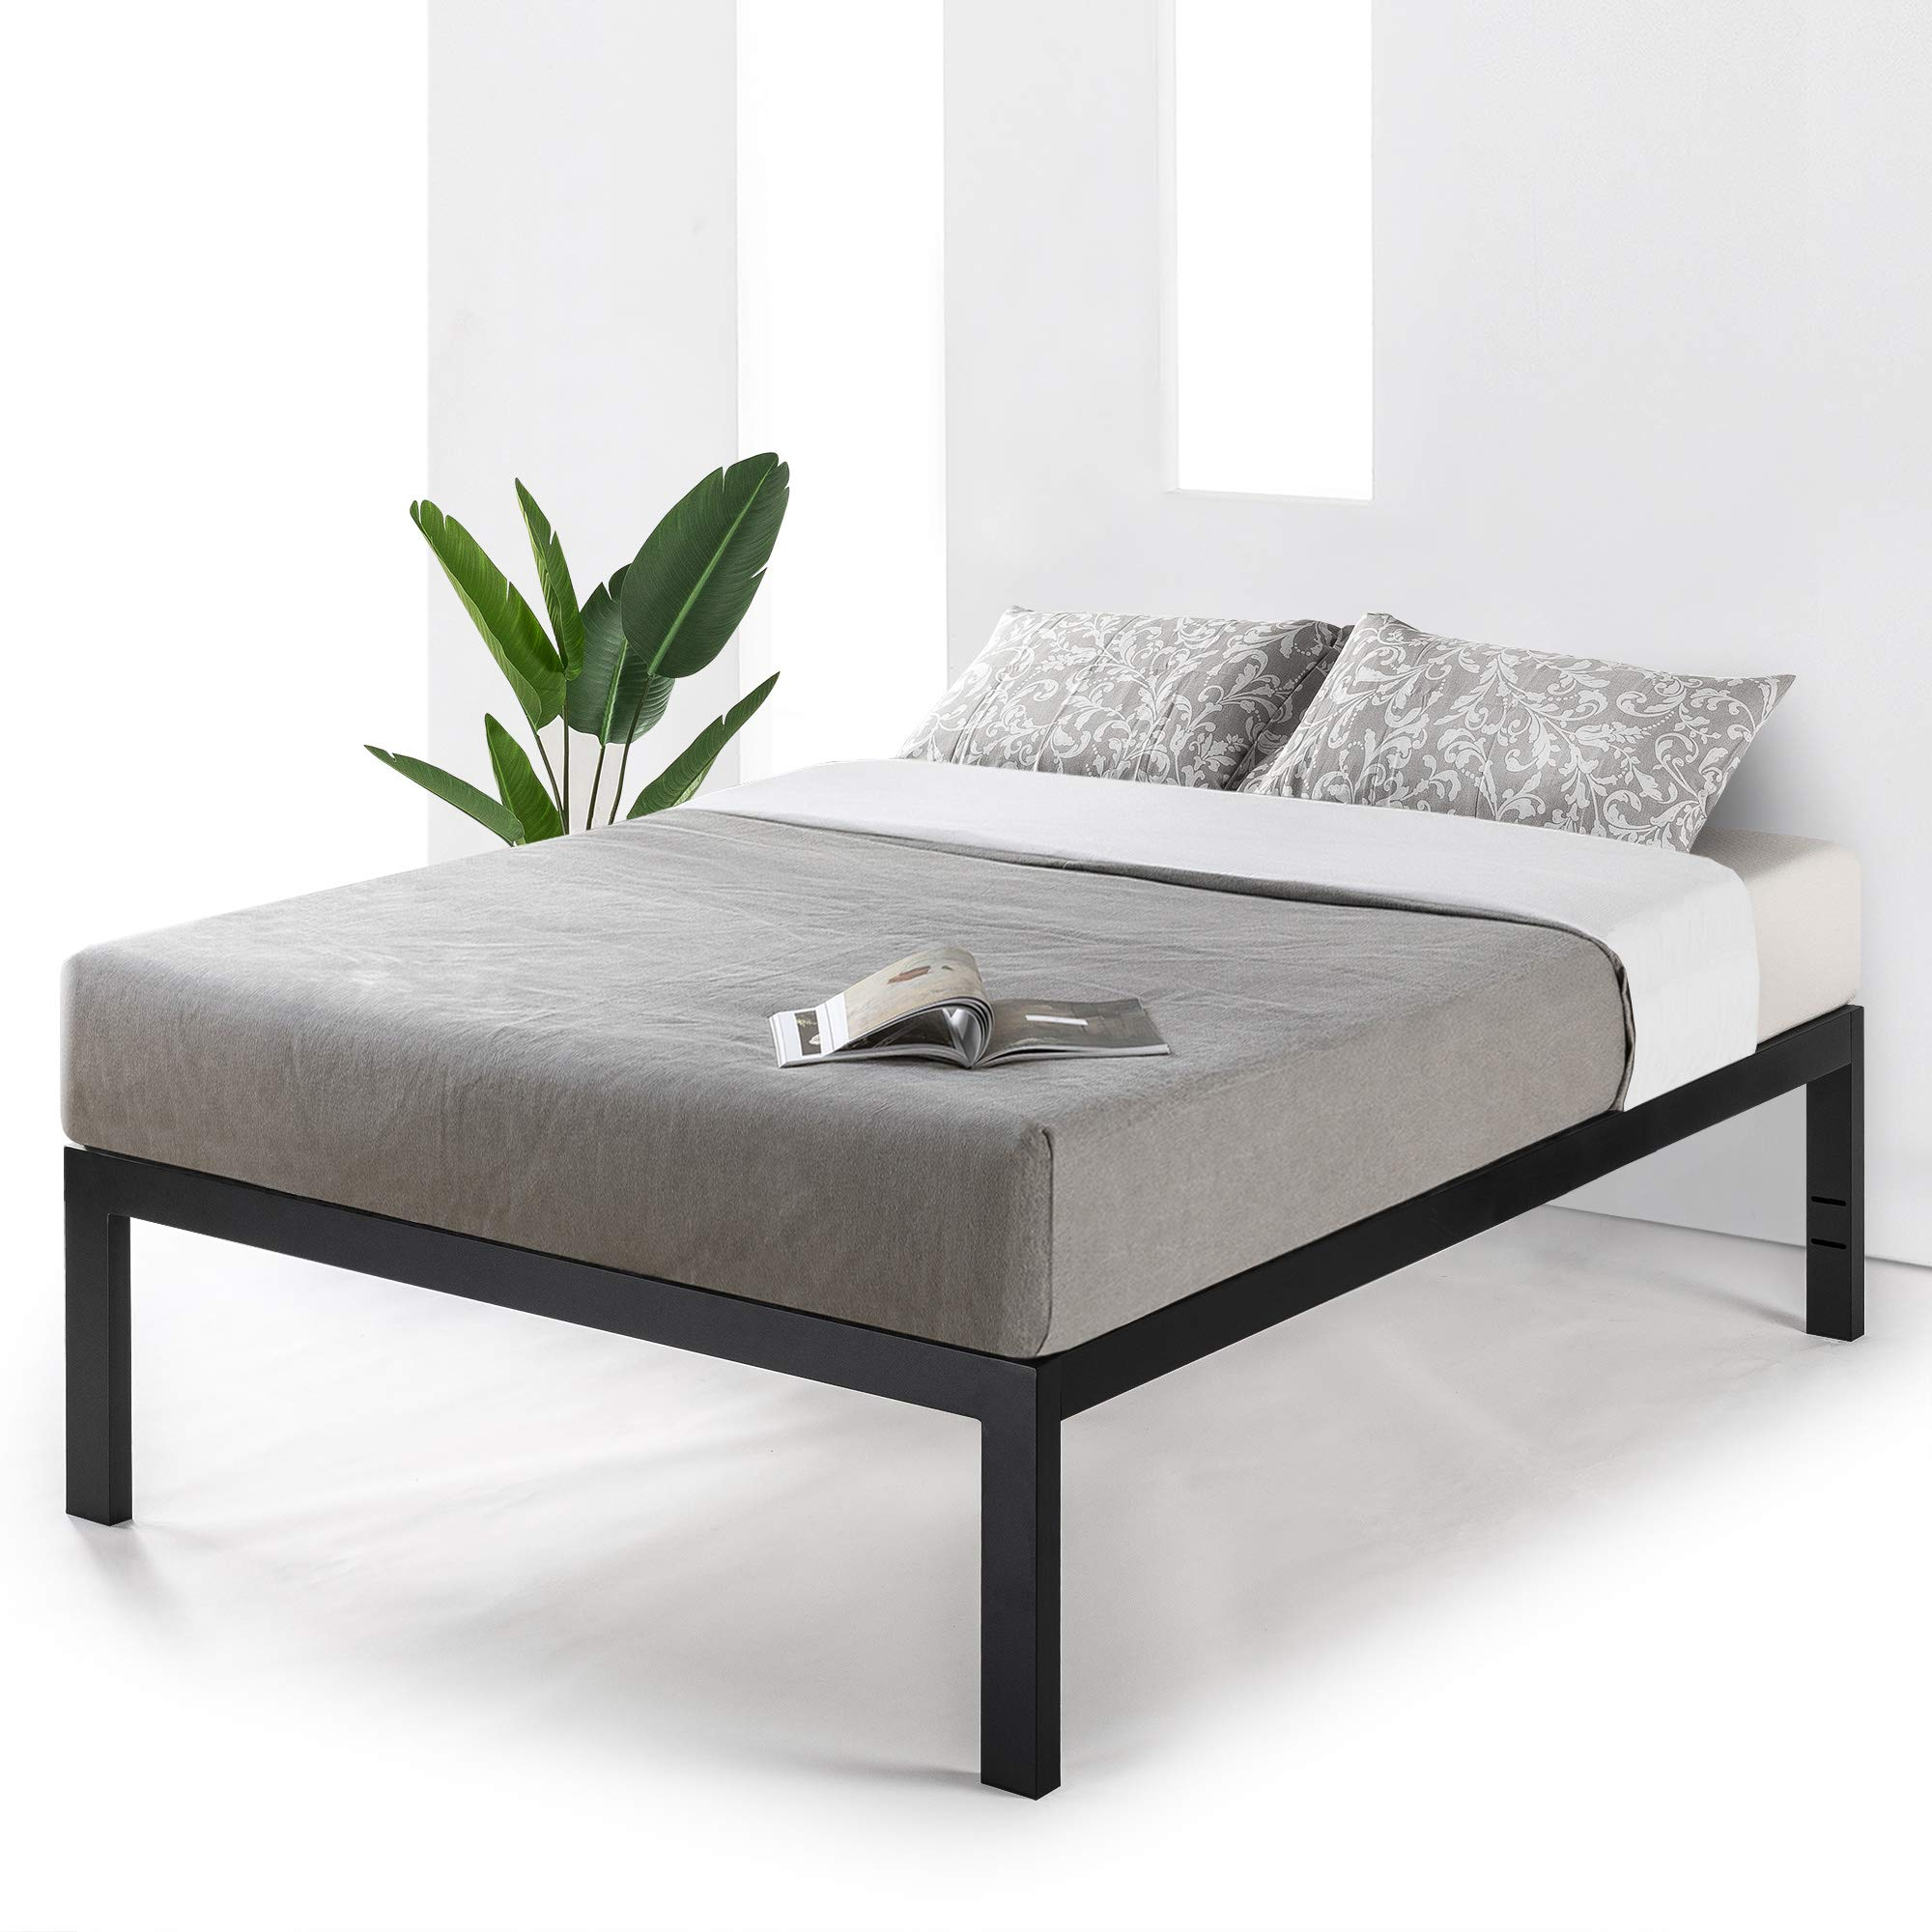 Mellow JustMallet Queen Frame 18 inch Heavy Duty Steel Platform Beds w/Wood Slat Mattress Foundation, Black